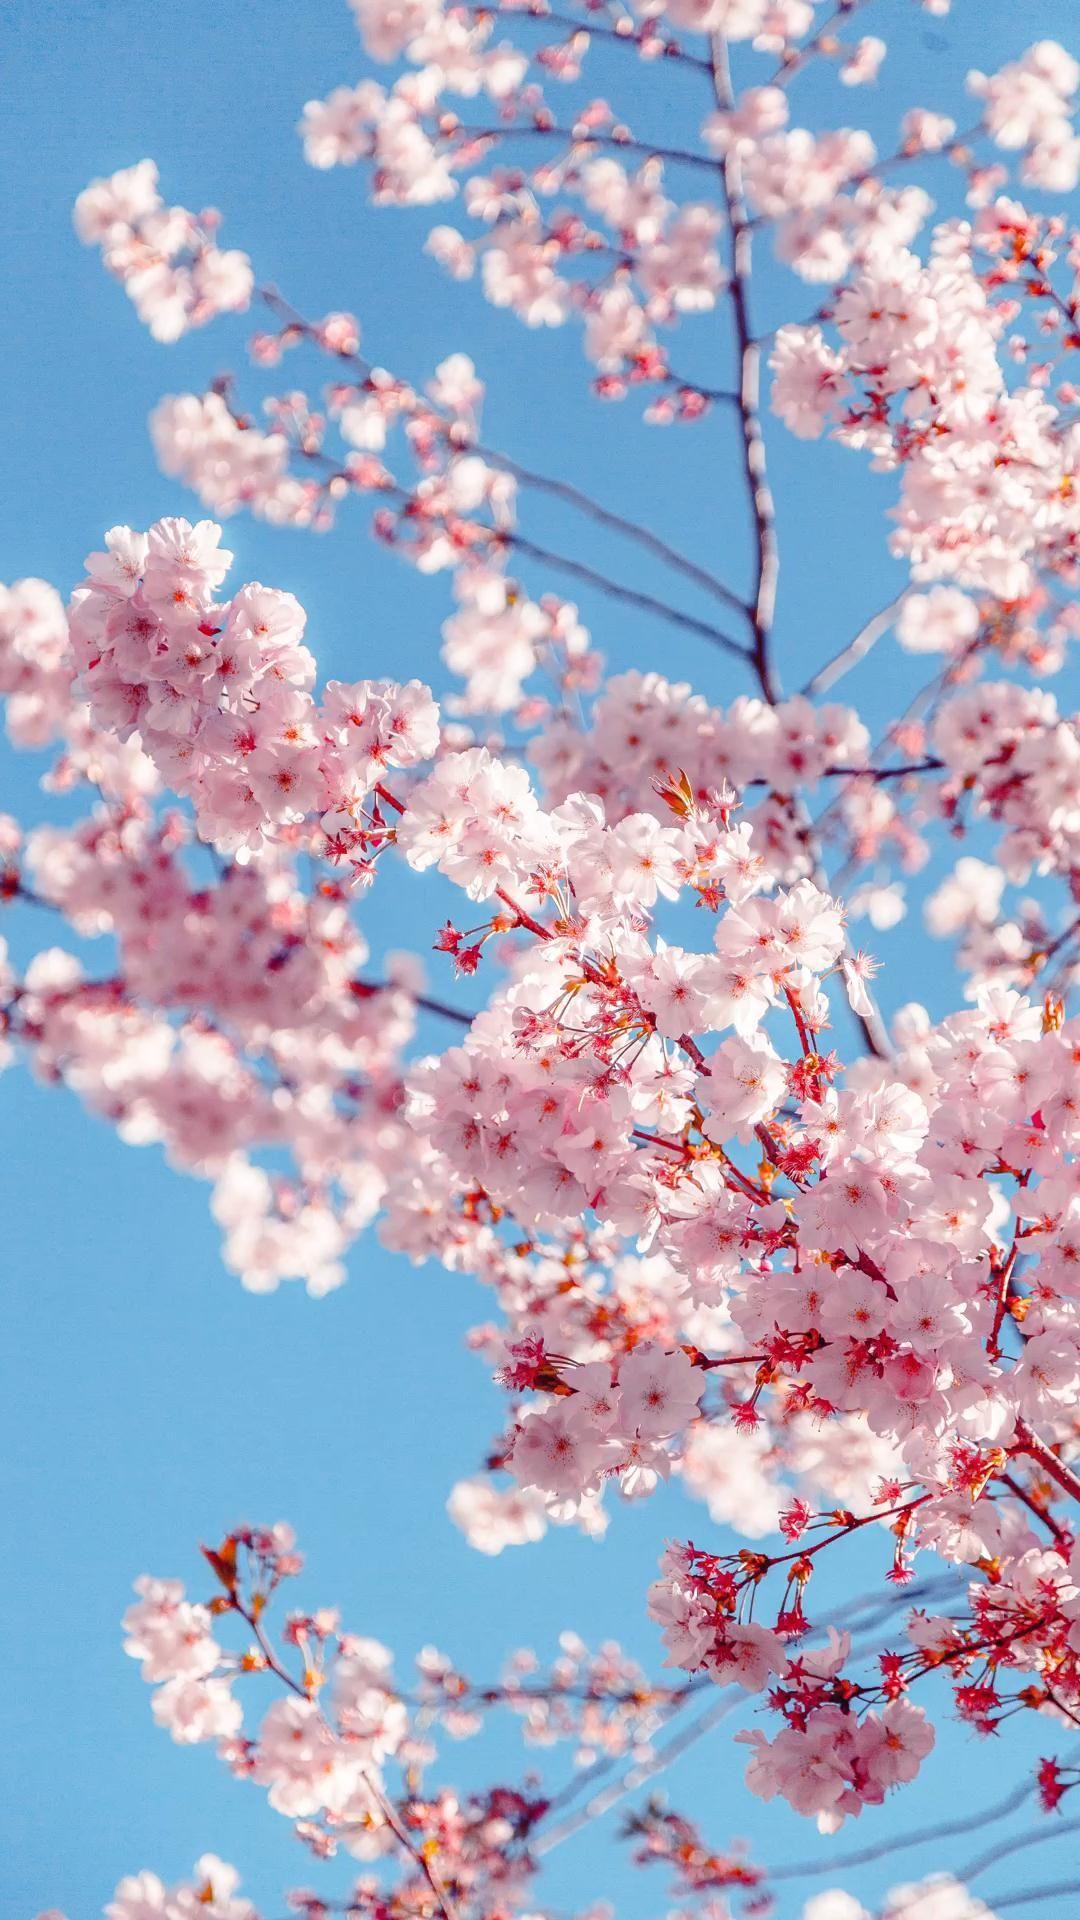 Plano de fundo céu/ flores/ natureza #natureza #flores #plantas #planodefundo #wallpaper